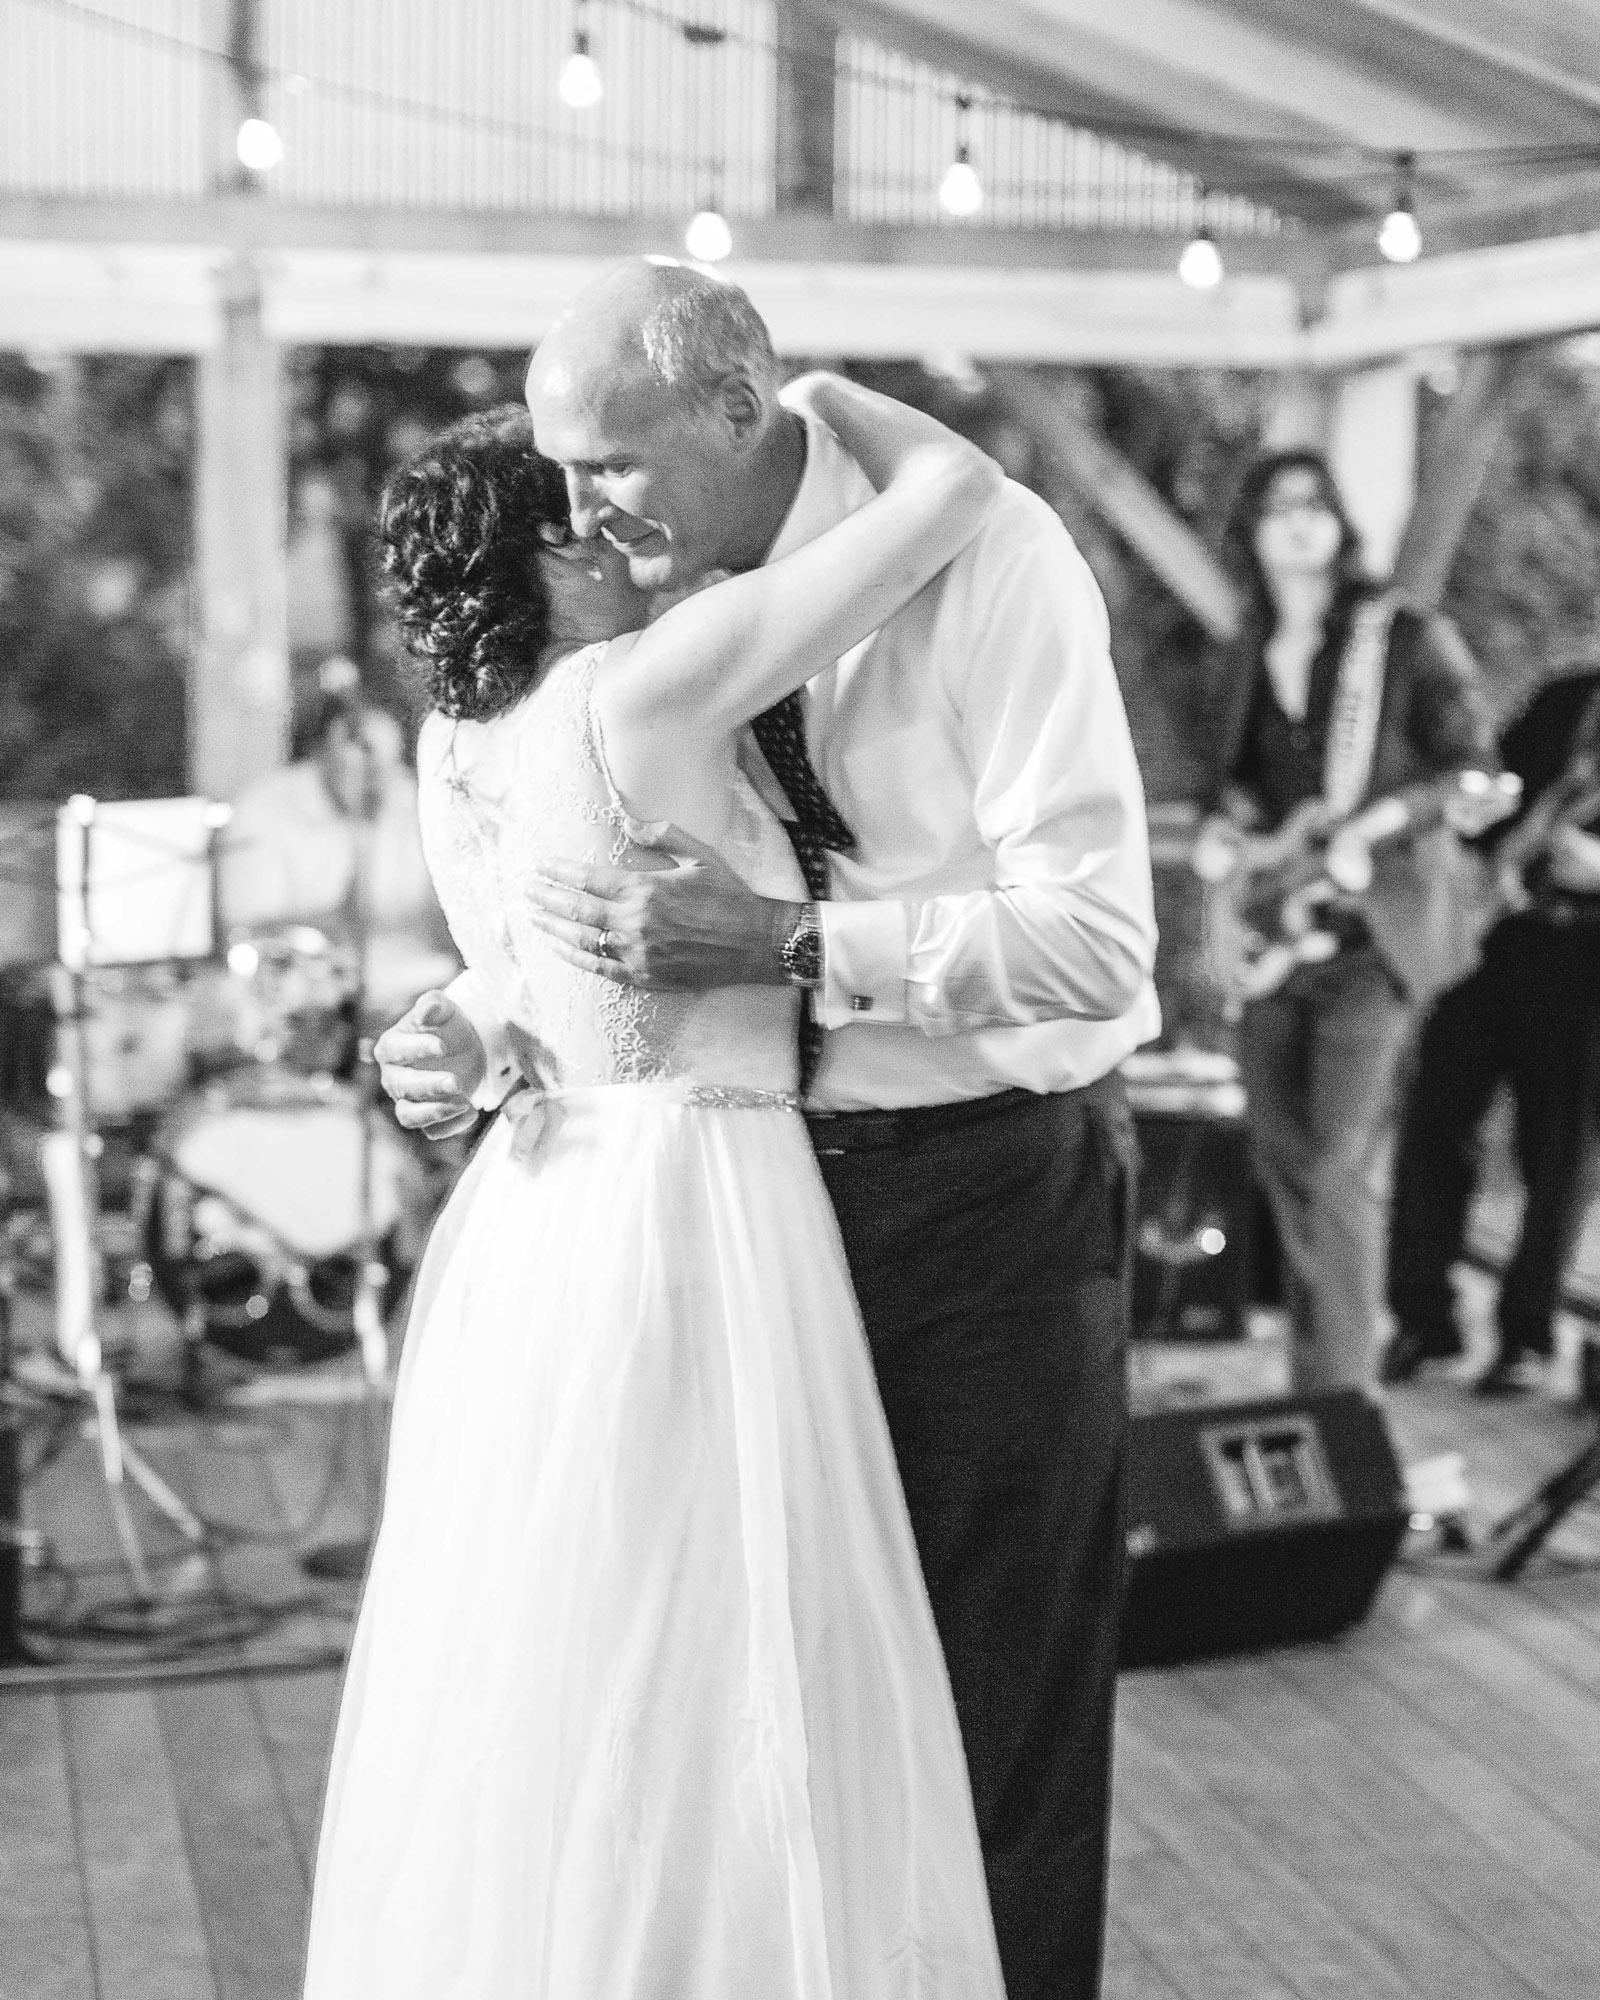 sarah-michael-wedding-dad-dance-967-s112783-0416.jpg